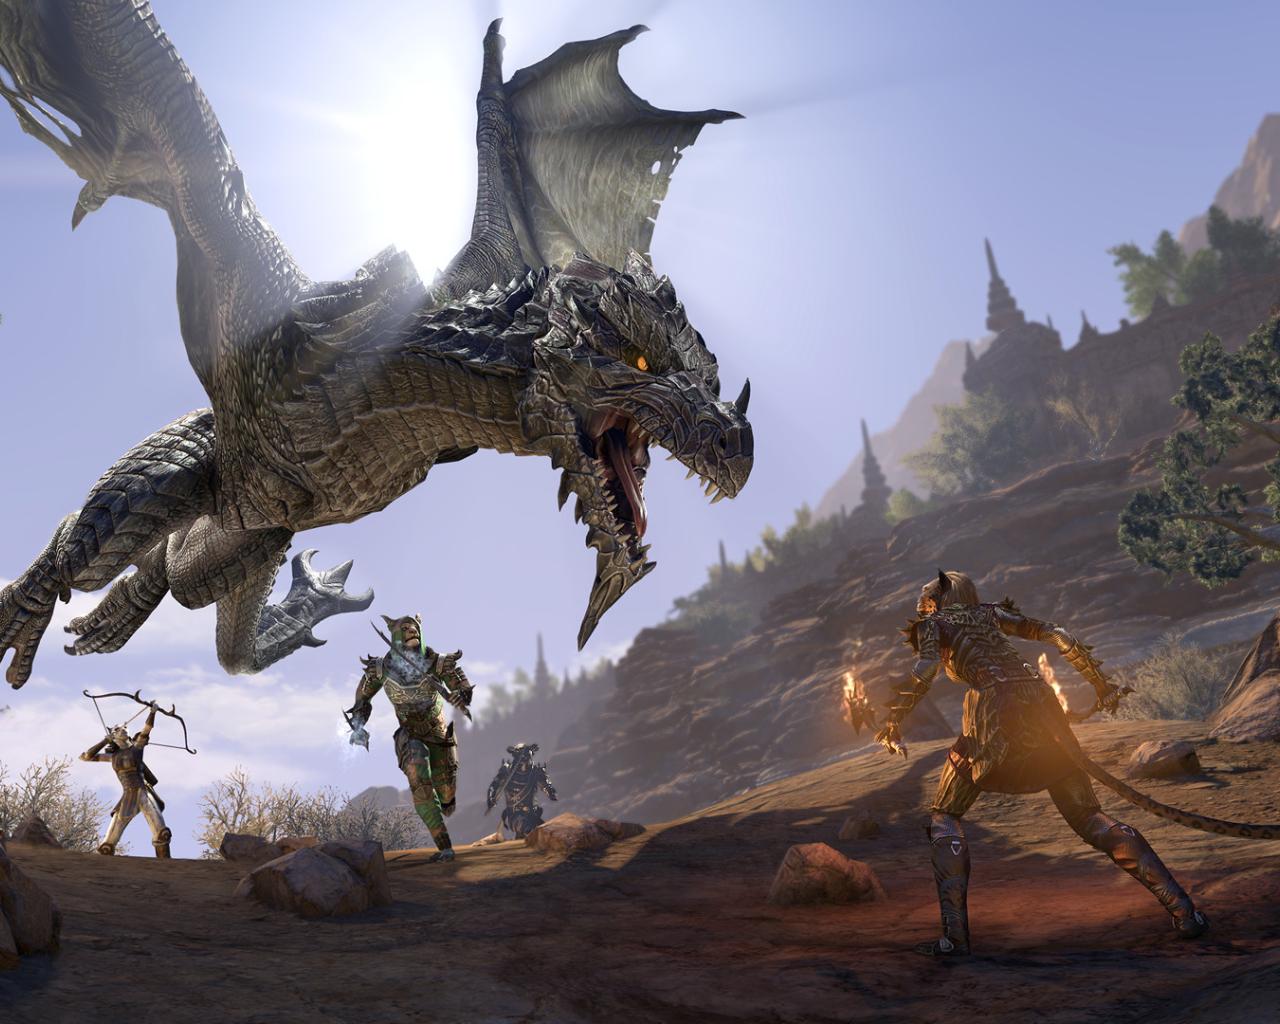 1280x1024 The Elder Scrolls Online Elsweyr Dragon 1280x1024